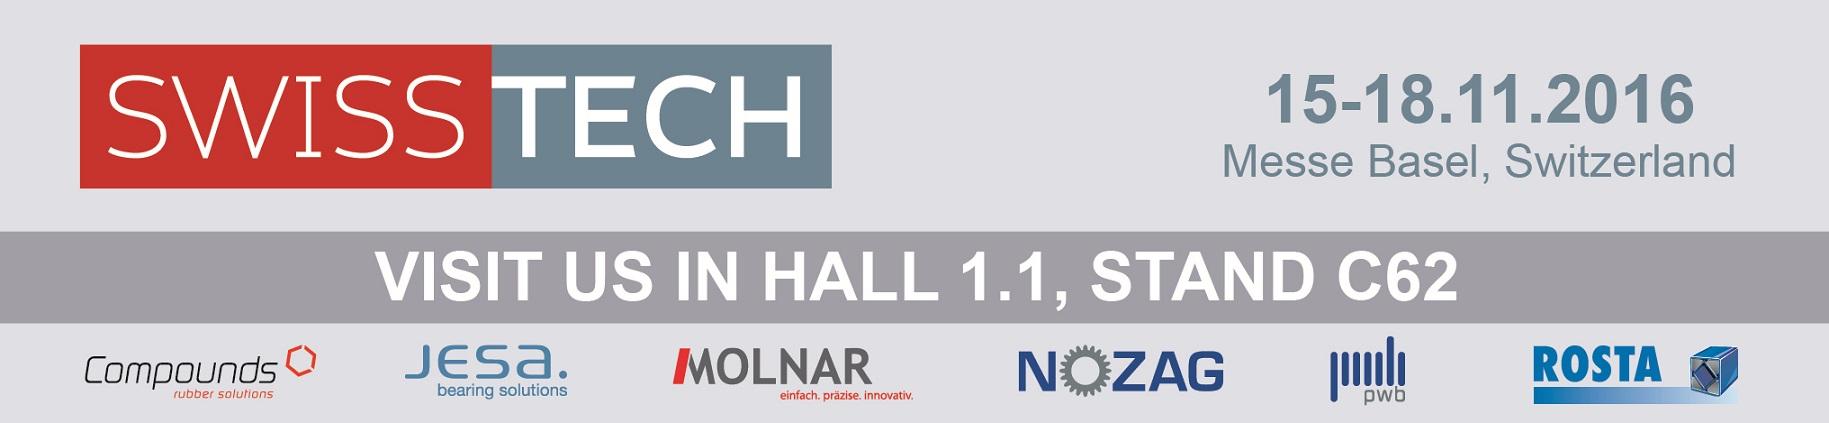 Invitation to swisstech exhibition invitation to the swisstech exhibition stopboris Image collections